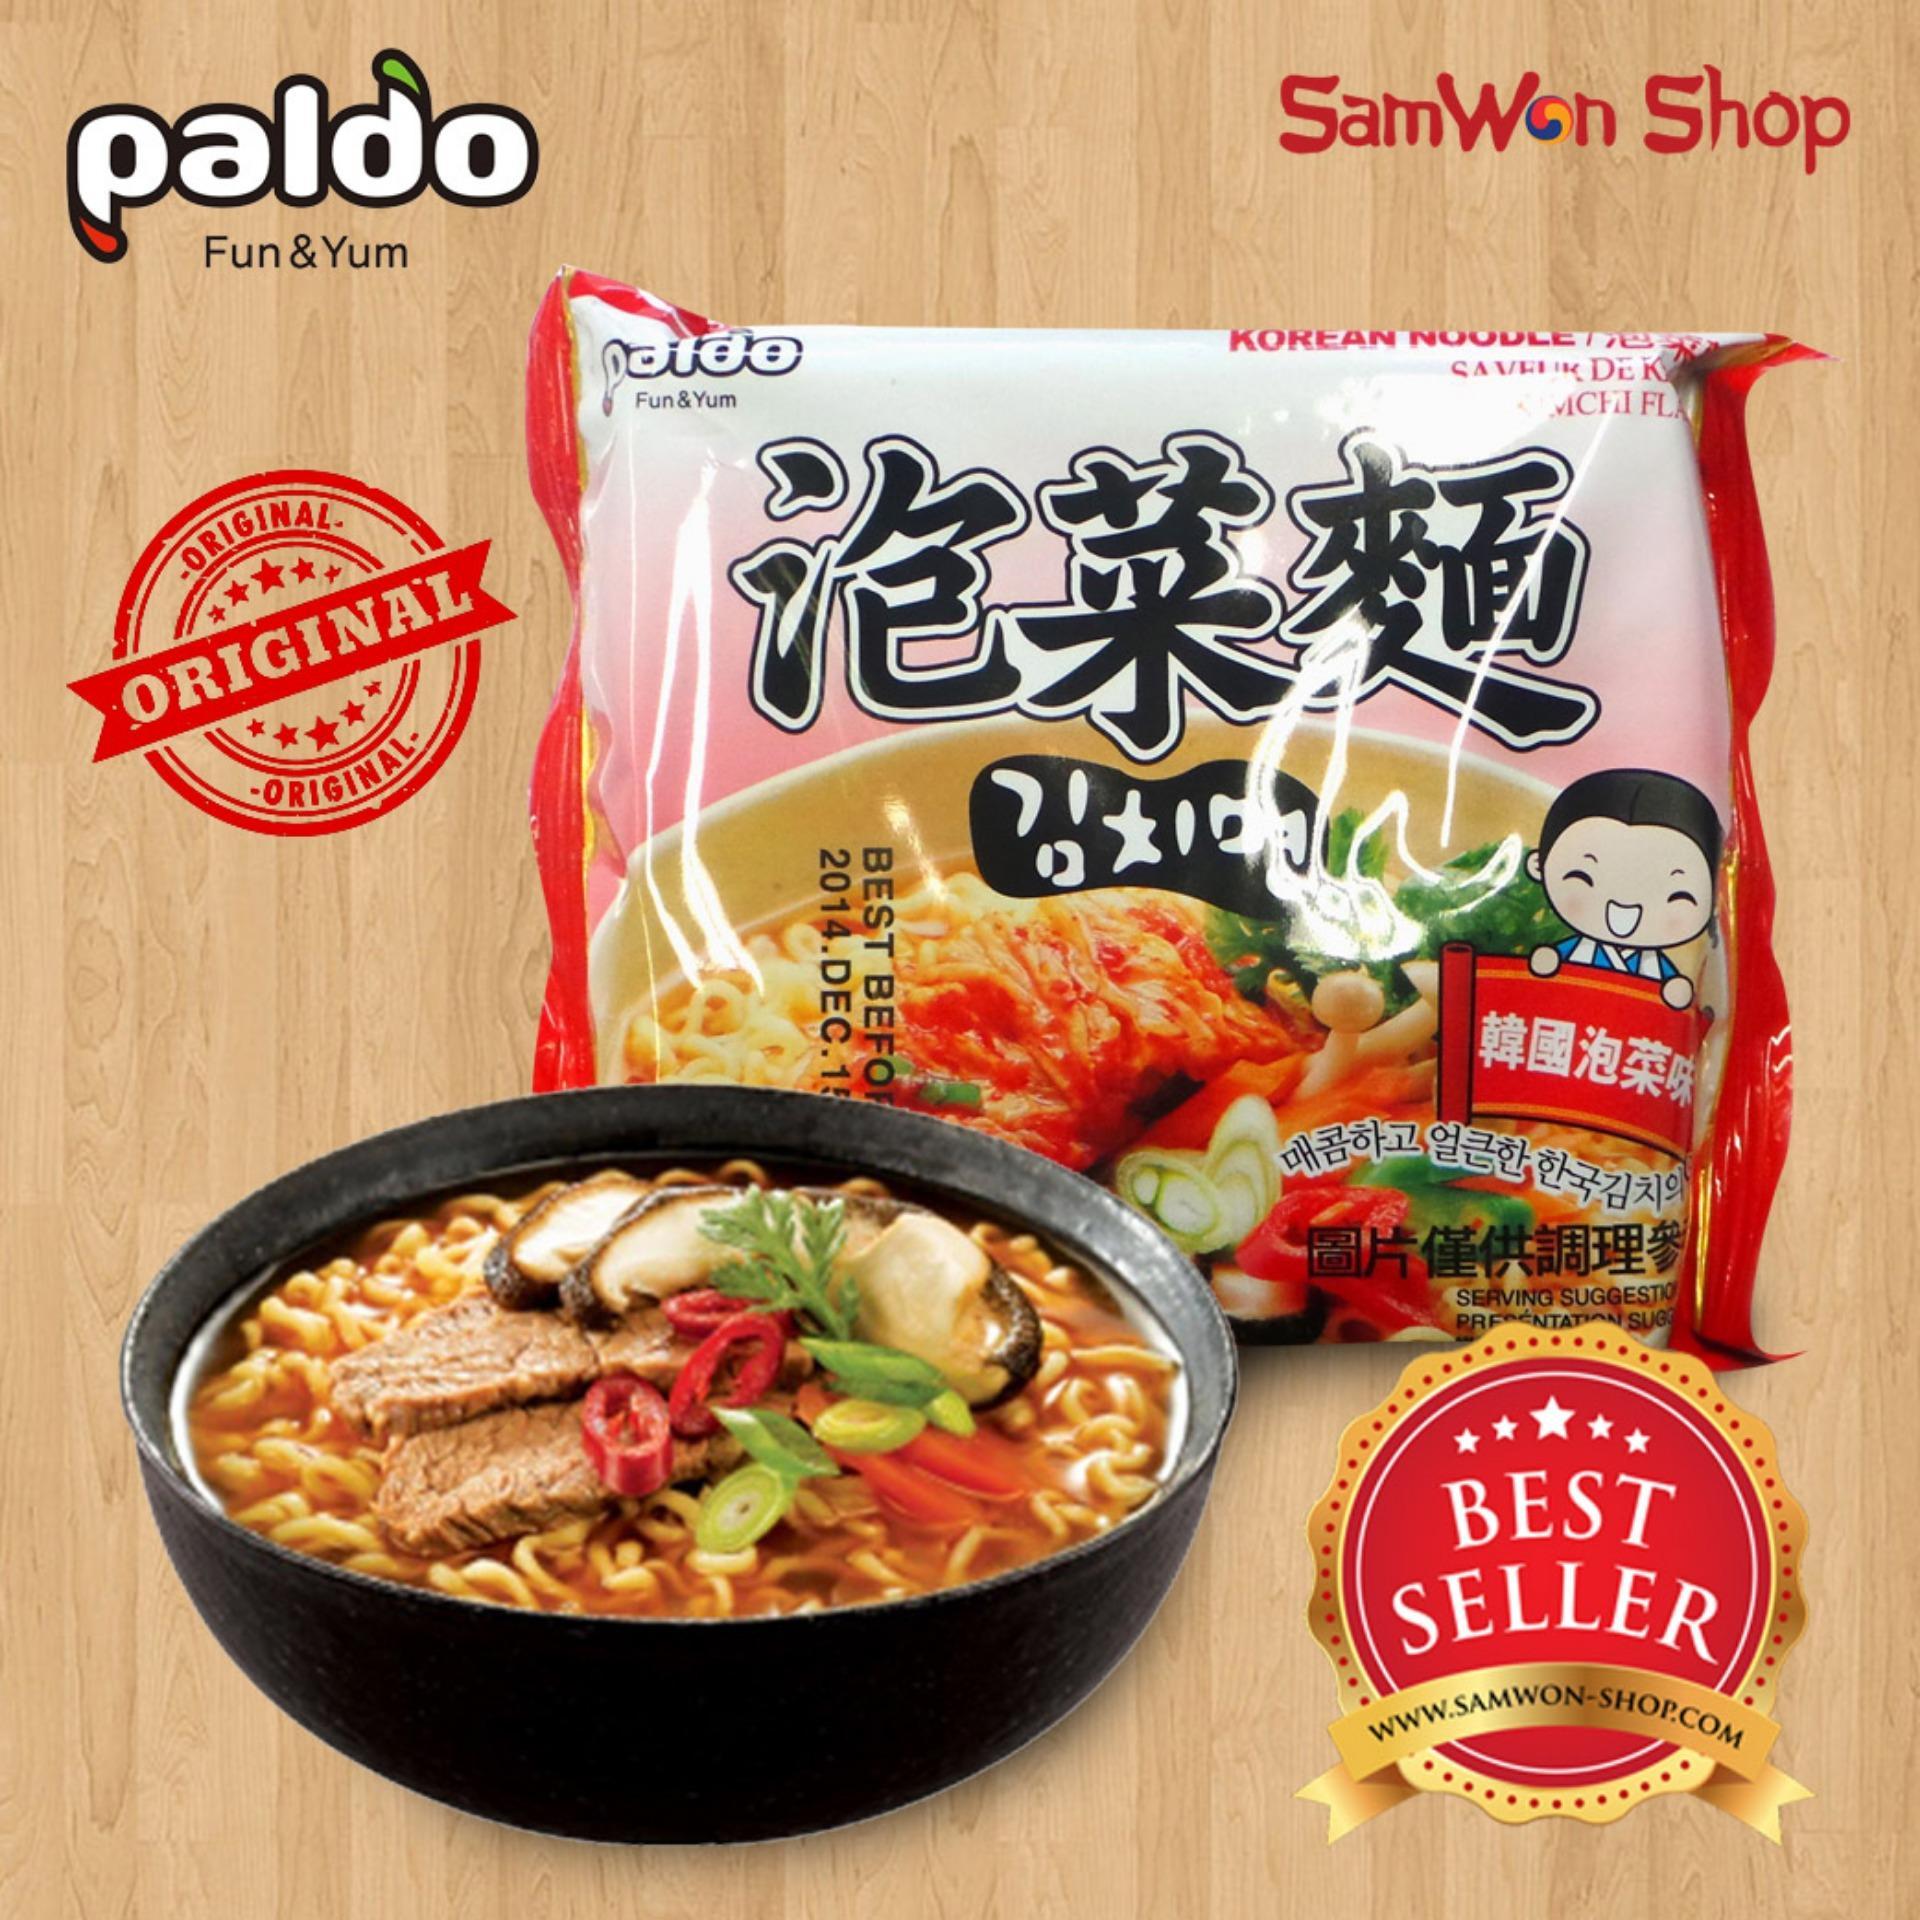 Paldo Kimchi Ramen - 120 Gram